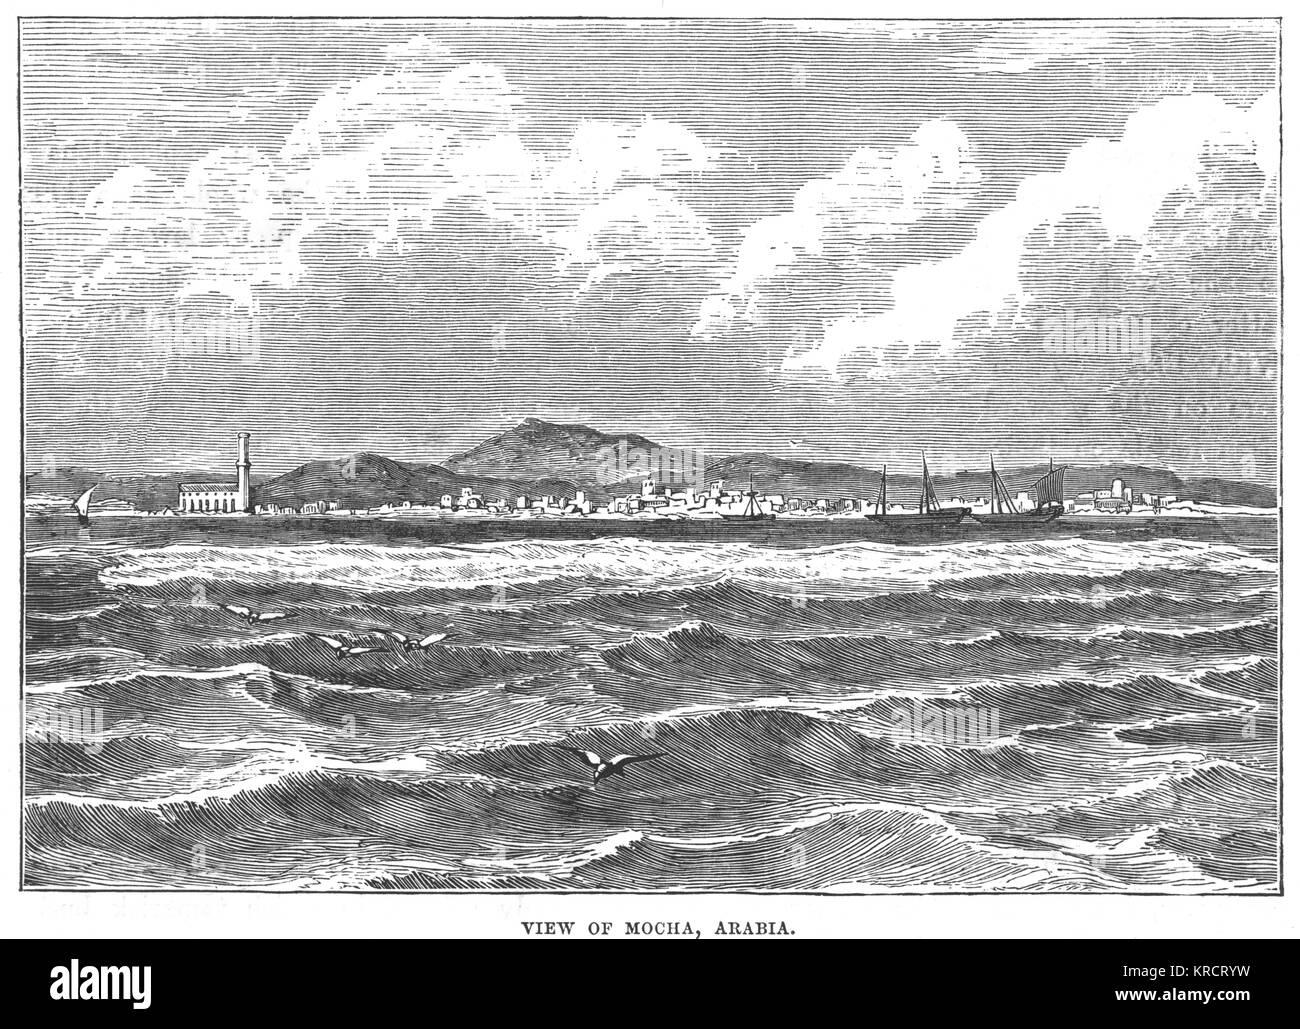 View of Mocha across water Date: 1870s - Stock Image